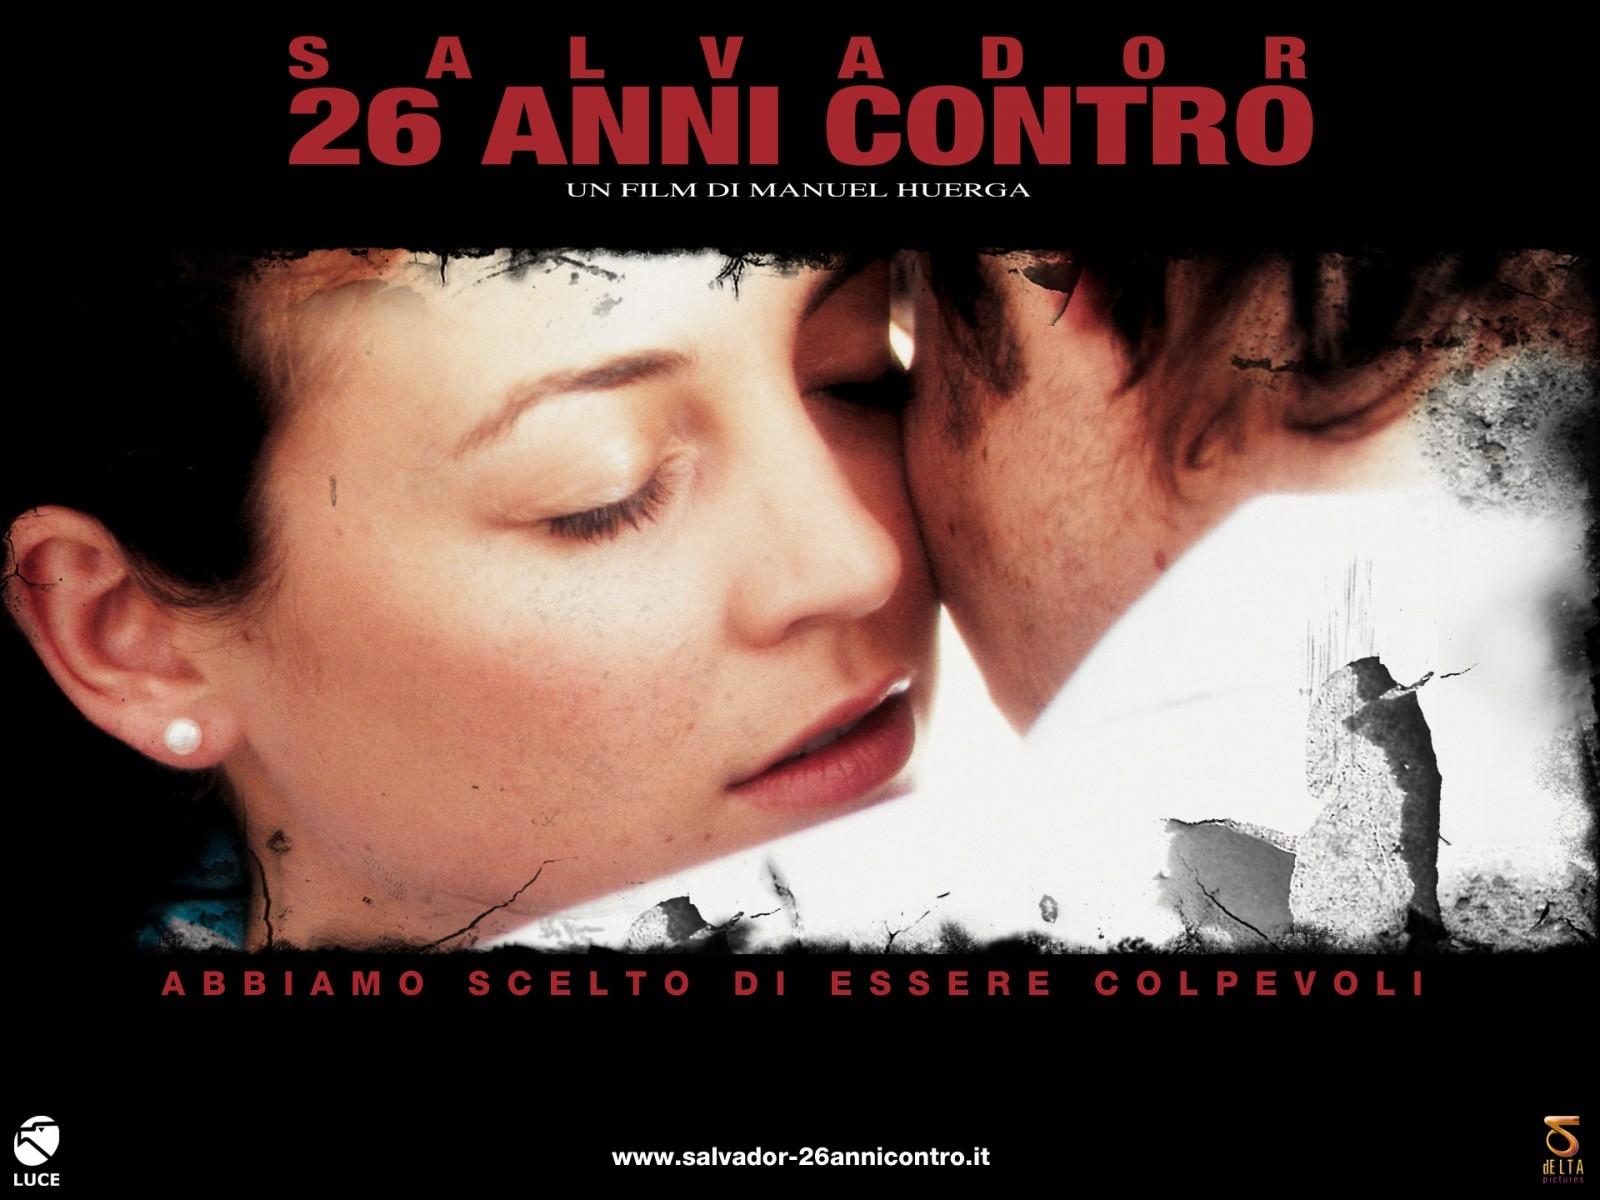 Wallpaper del film Salvador - 26 anni contro